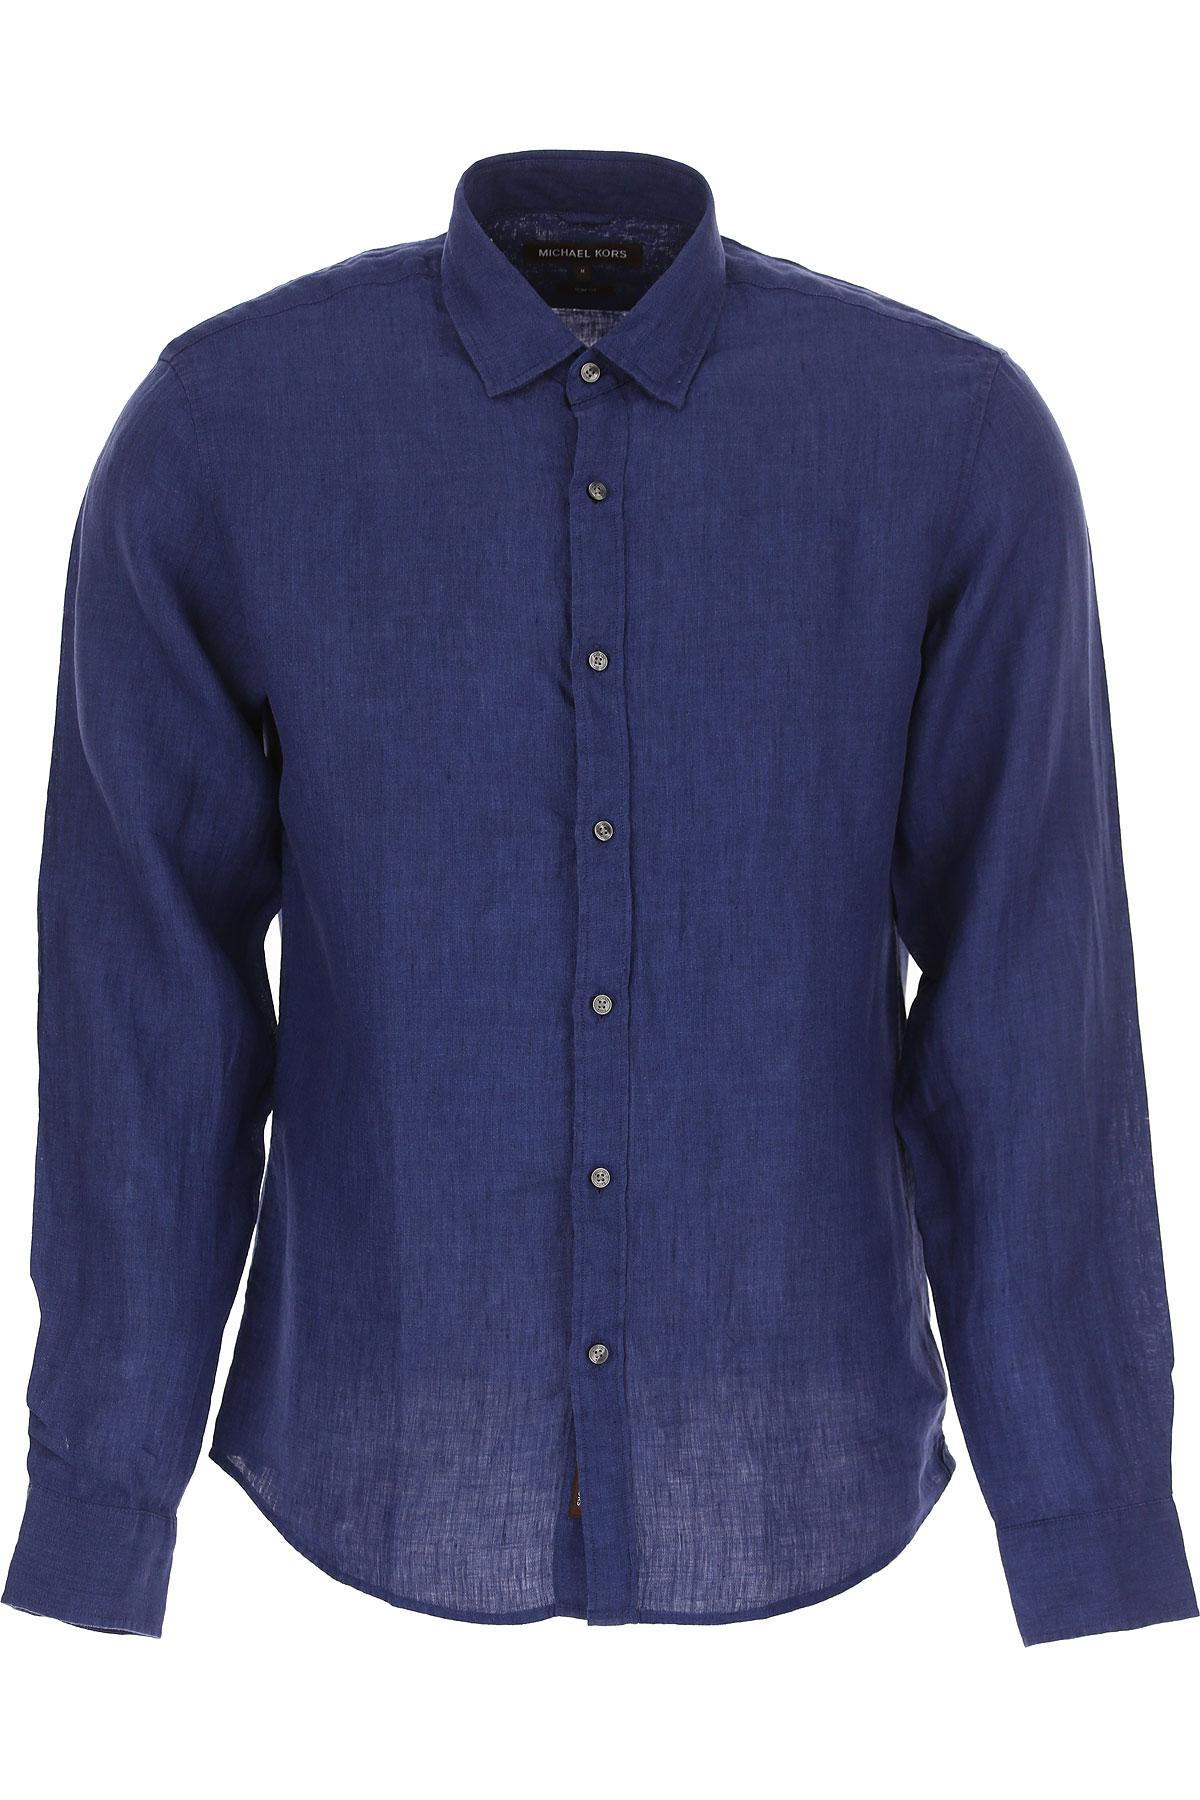 Michael Kors Shirt for Men On Sale, Dark Blue, linen, 2017, S ⢠IT 46 M ⢠IT 48 L ⢠IT 50 XL ⢠IT 52